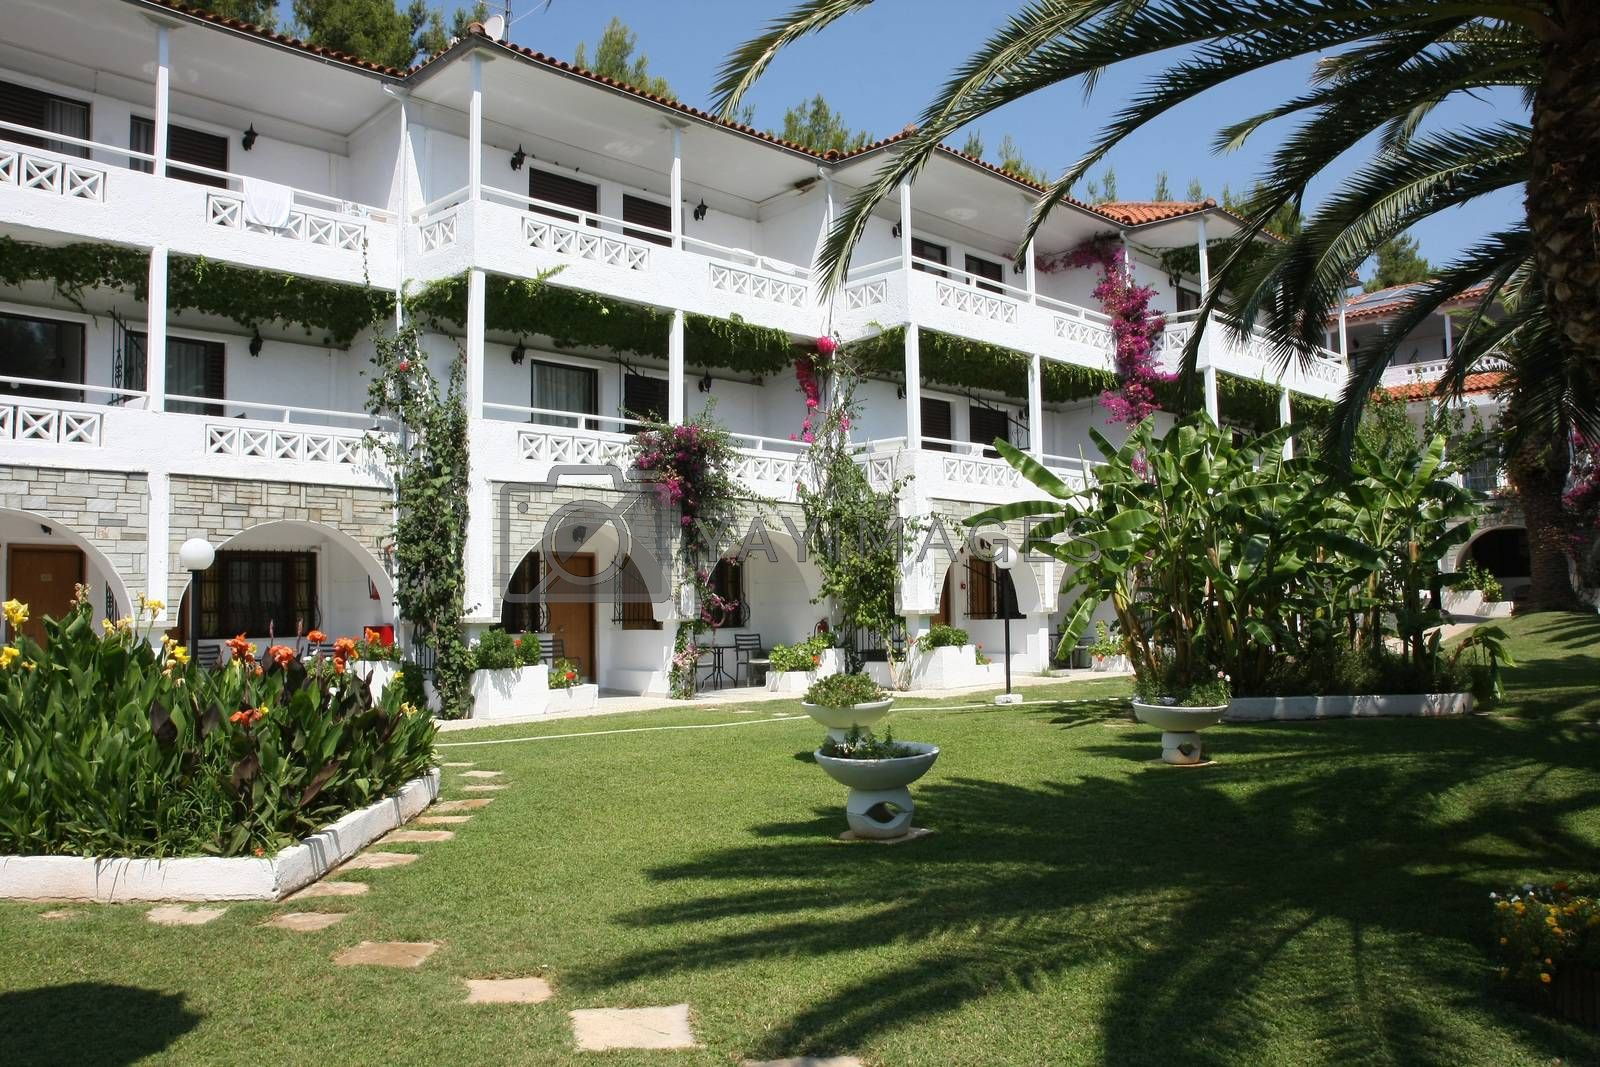 NIKITI,GREECE-JUl  07 , 2016: View at inboard garden in Porfi Beach hotel,Greeece